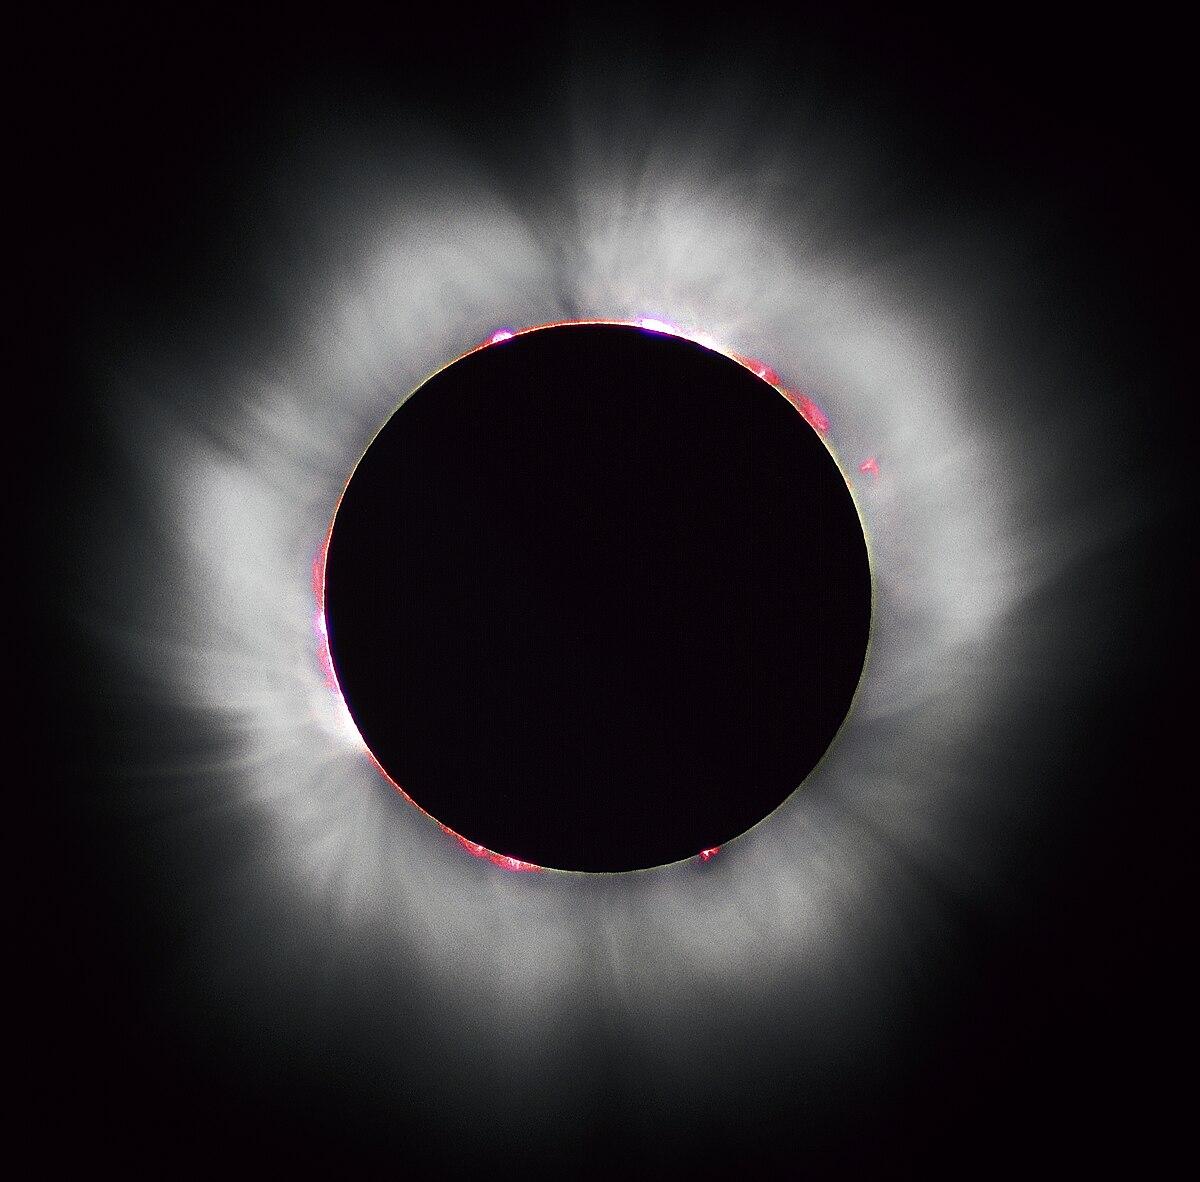 1200px-Solar_eclipse_1999_4.jpg